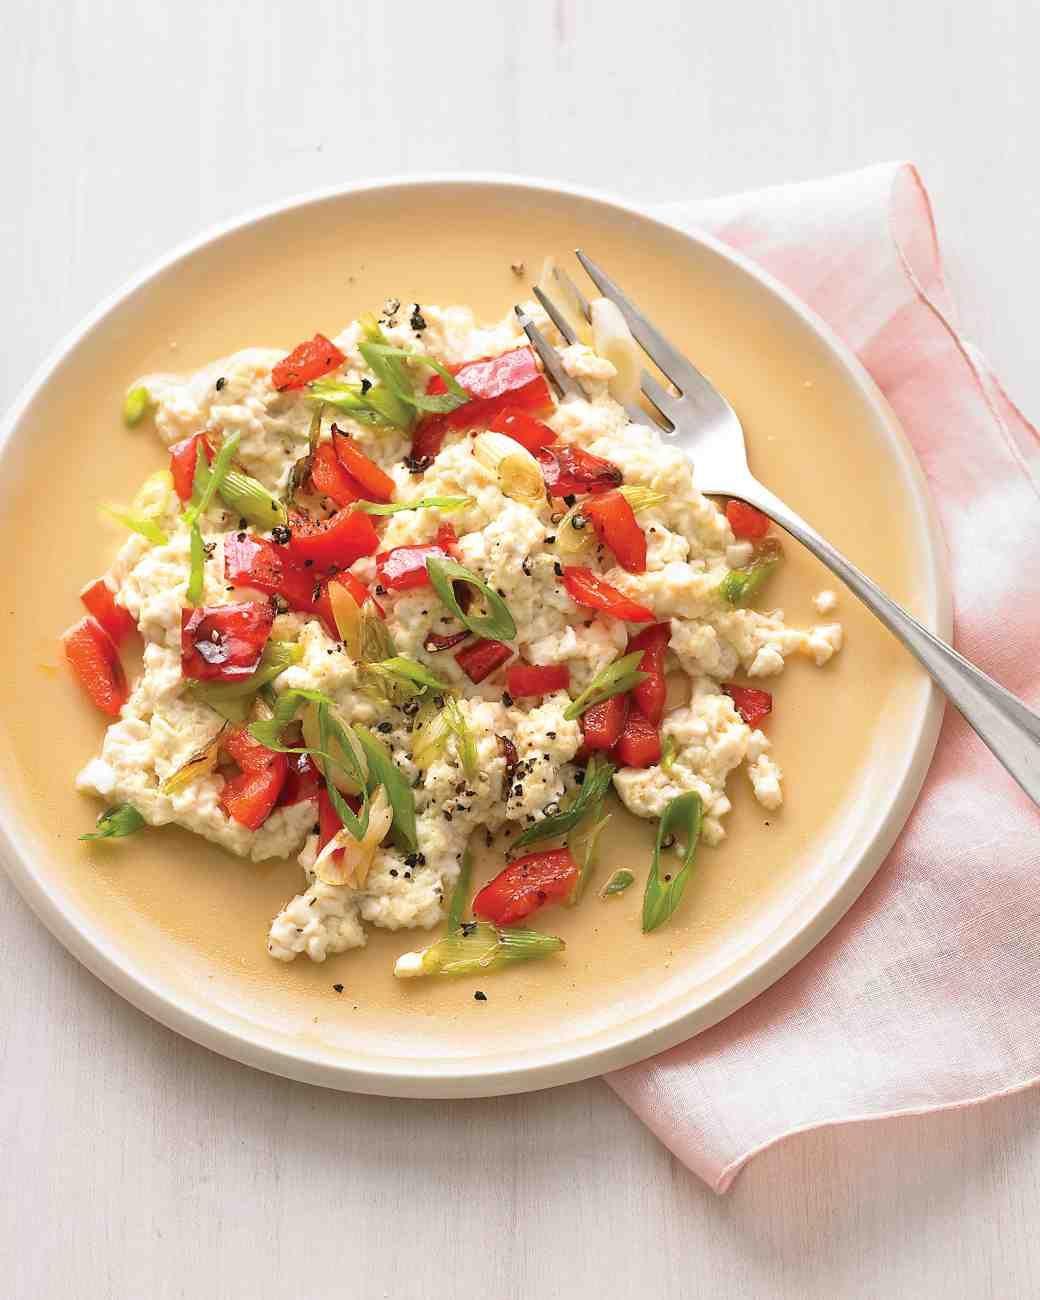 Protein-Packed Breakfast + Veggies